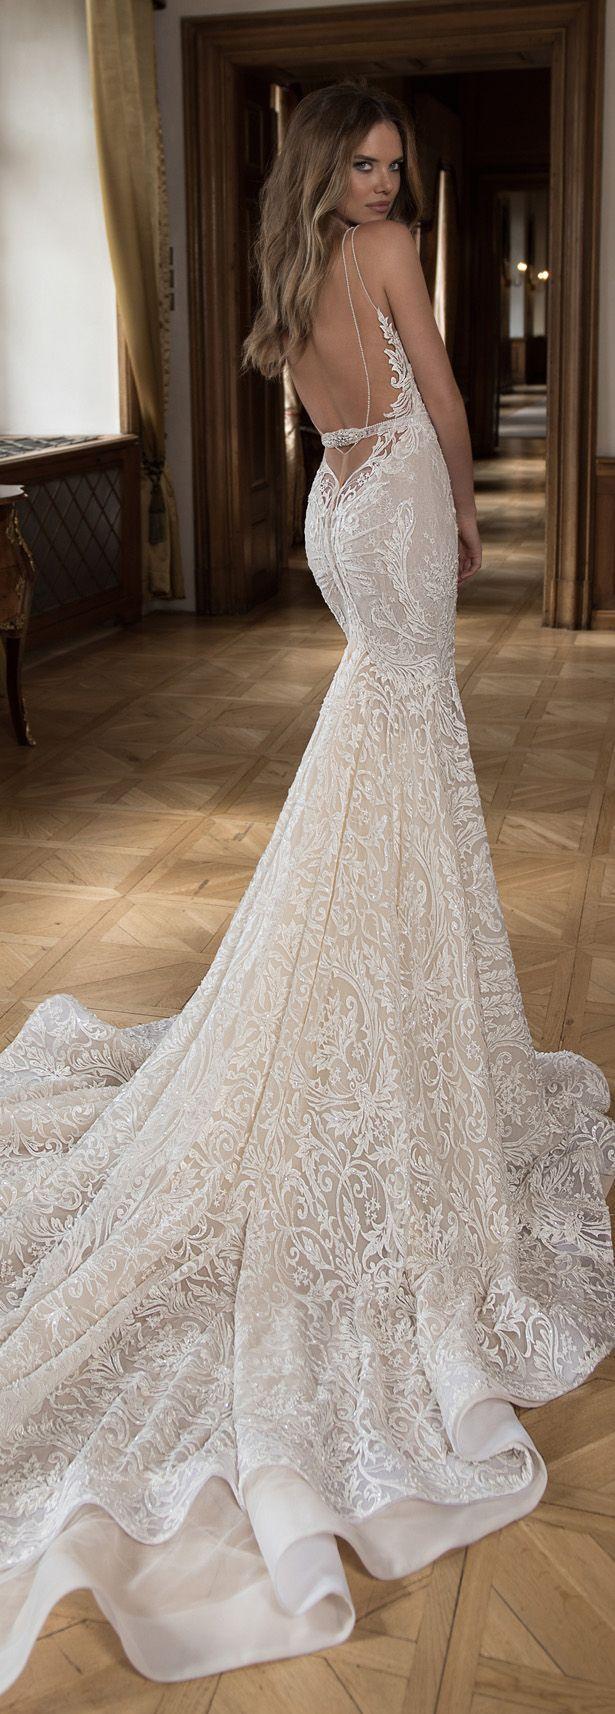 Mermaid wedding dresses with feather bottom   best wedding ideas images on Pinterest  Wedding bridesmaid